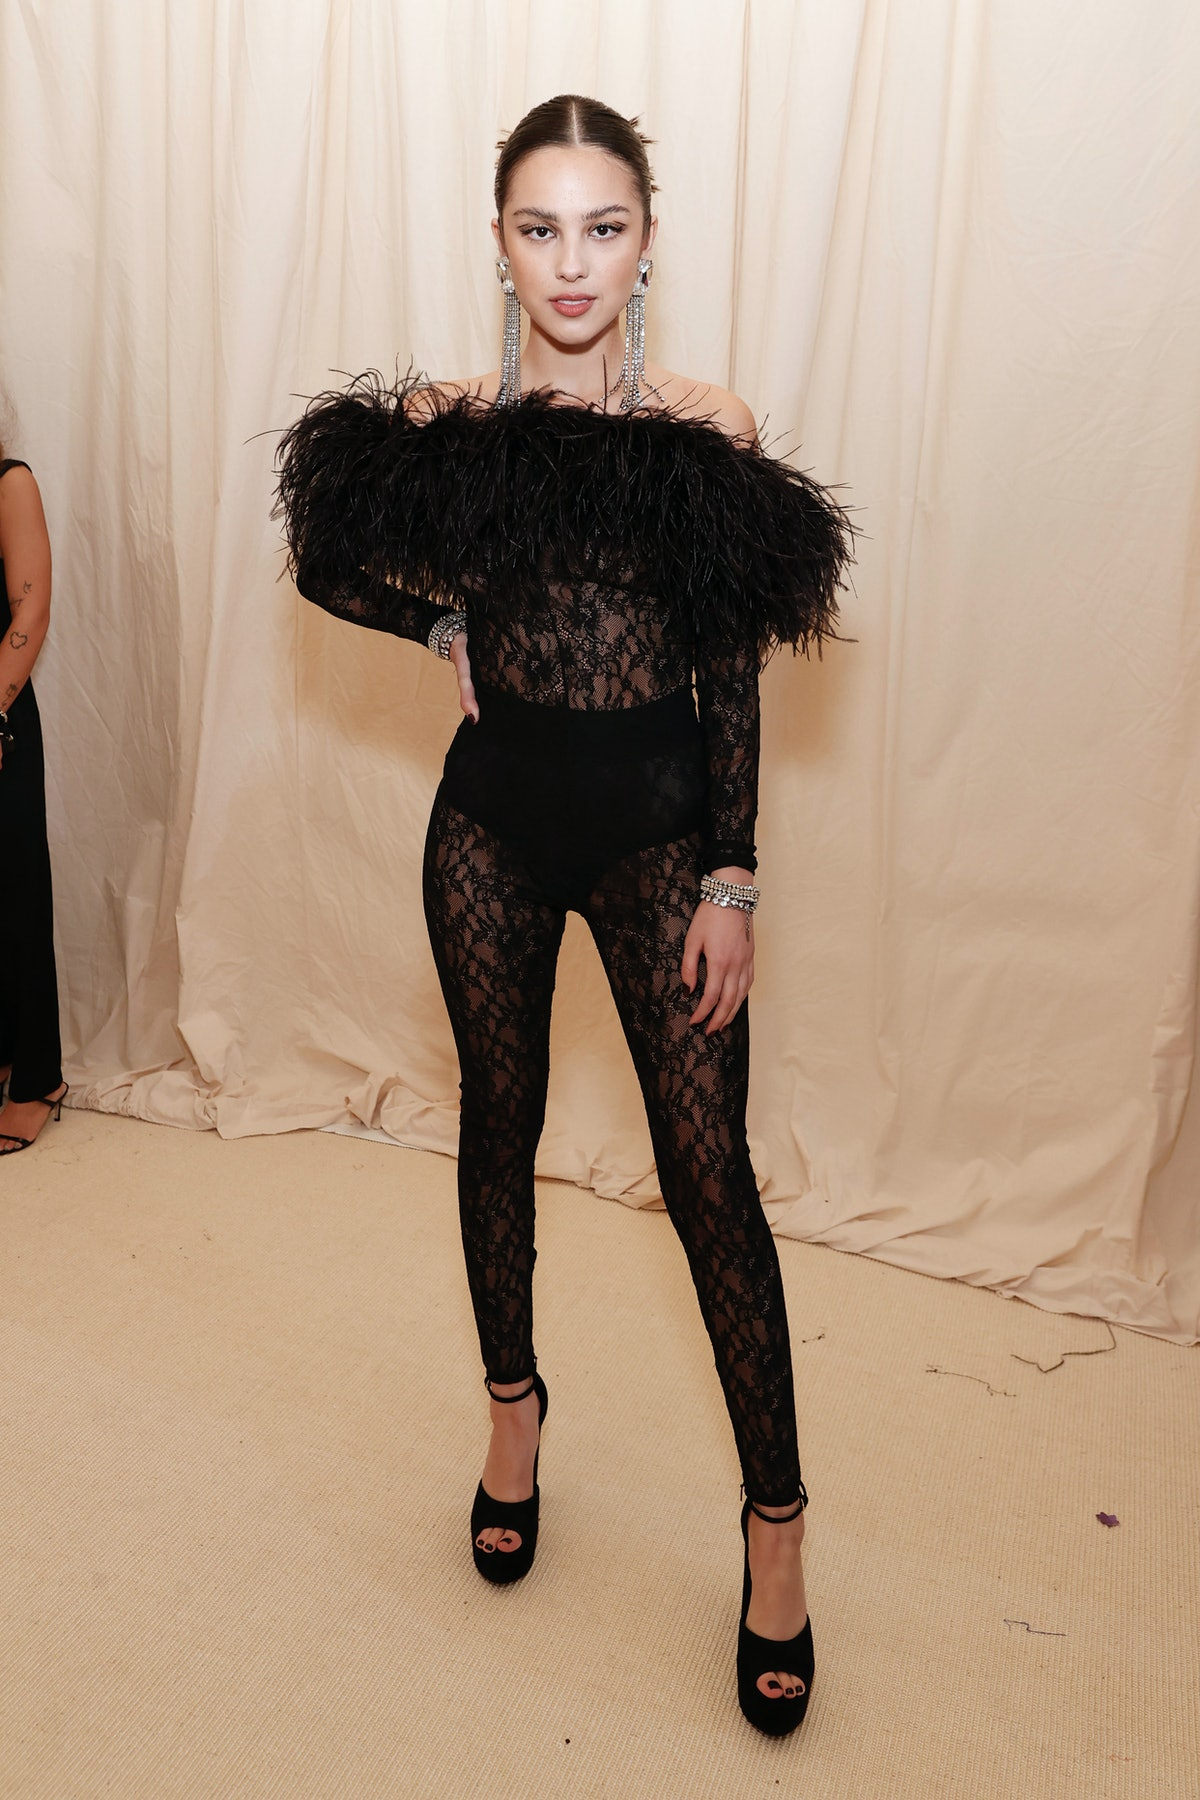 Olivia Rodrigo wore a feathered bodysuit to the 2021 Met Gala.